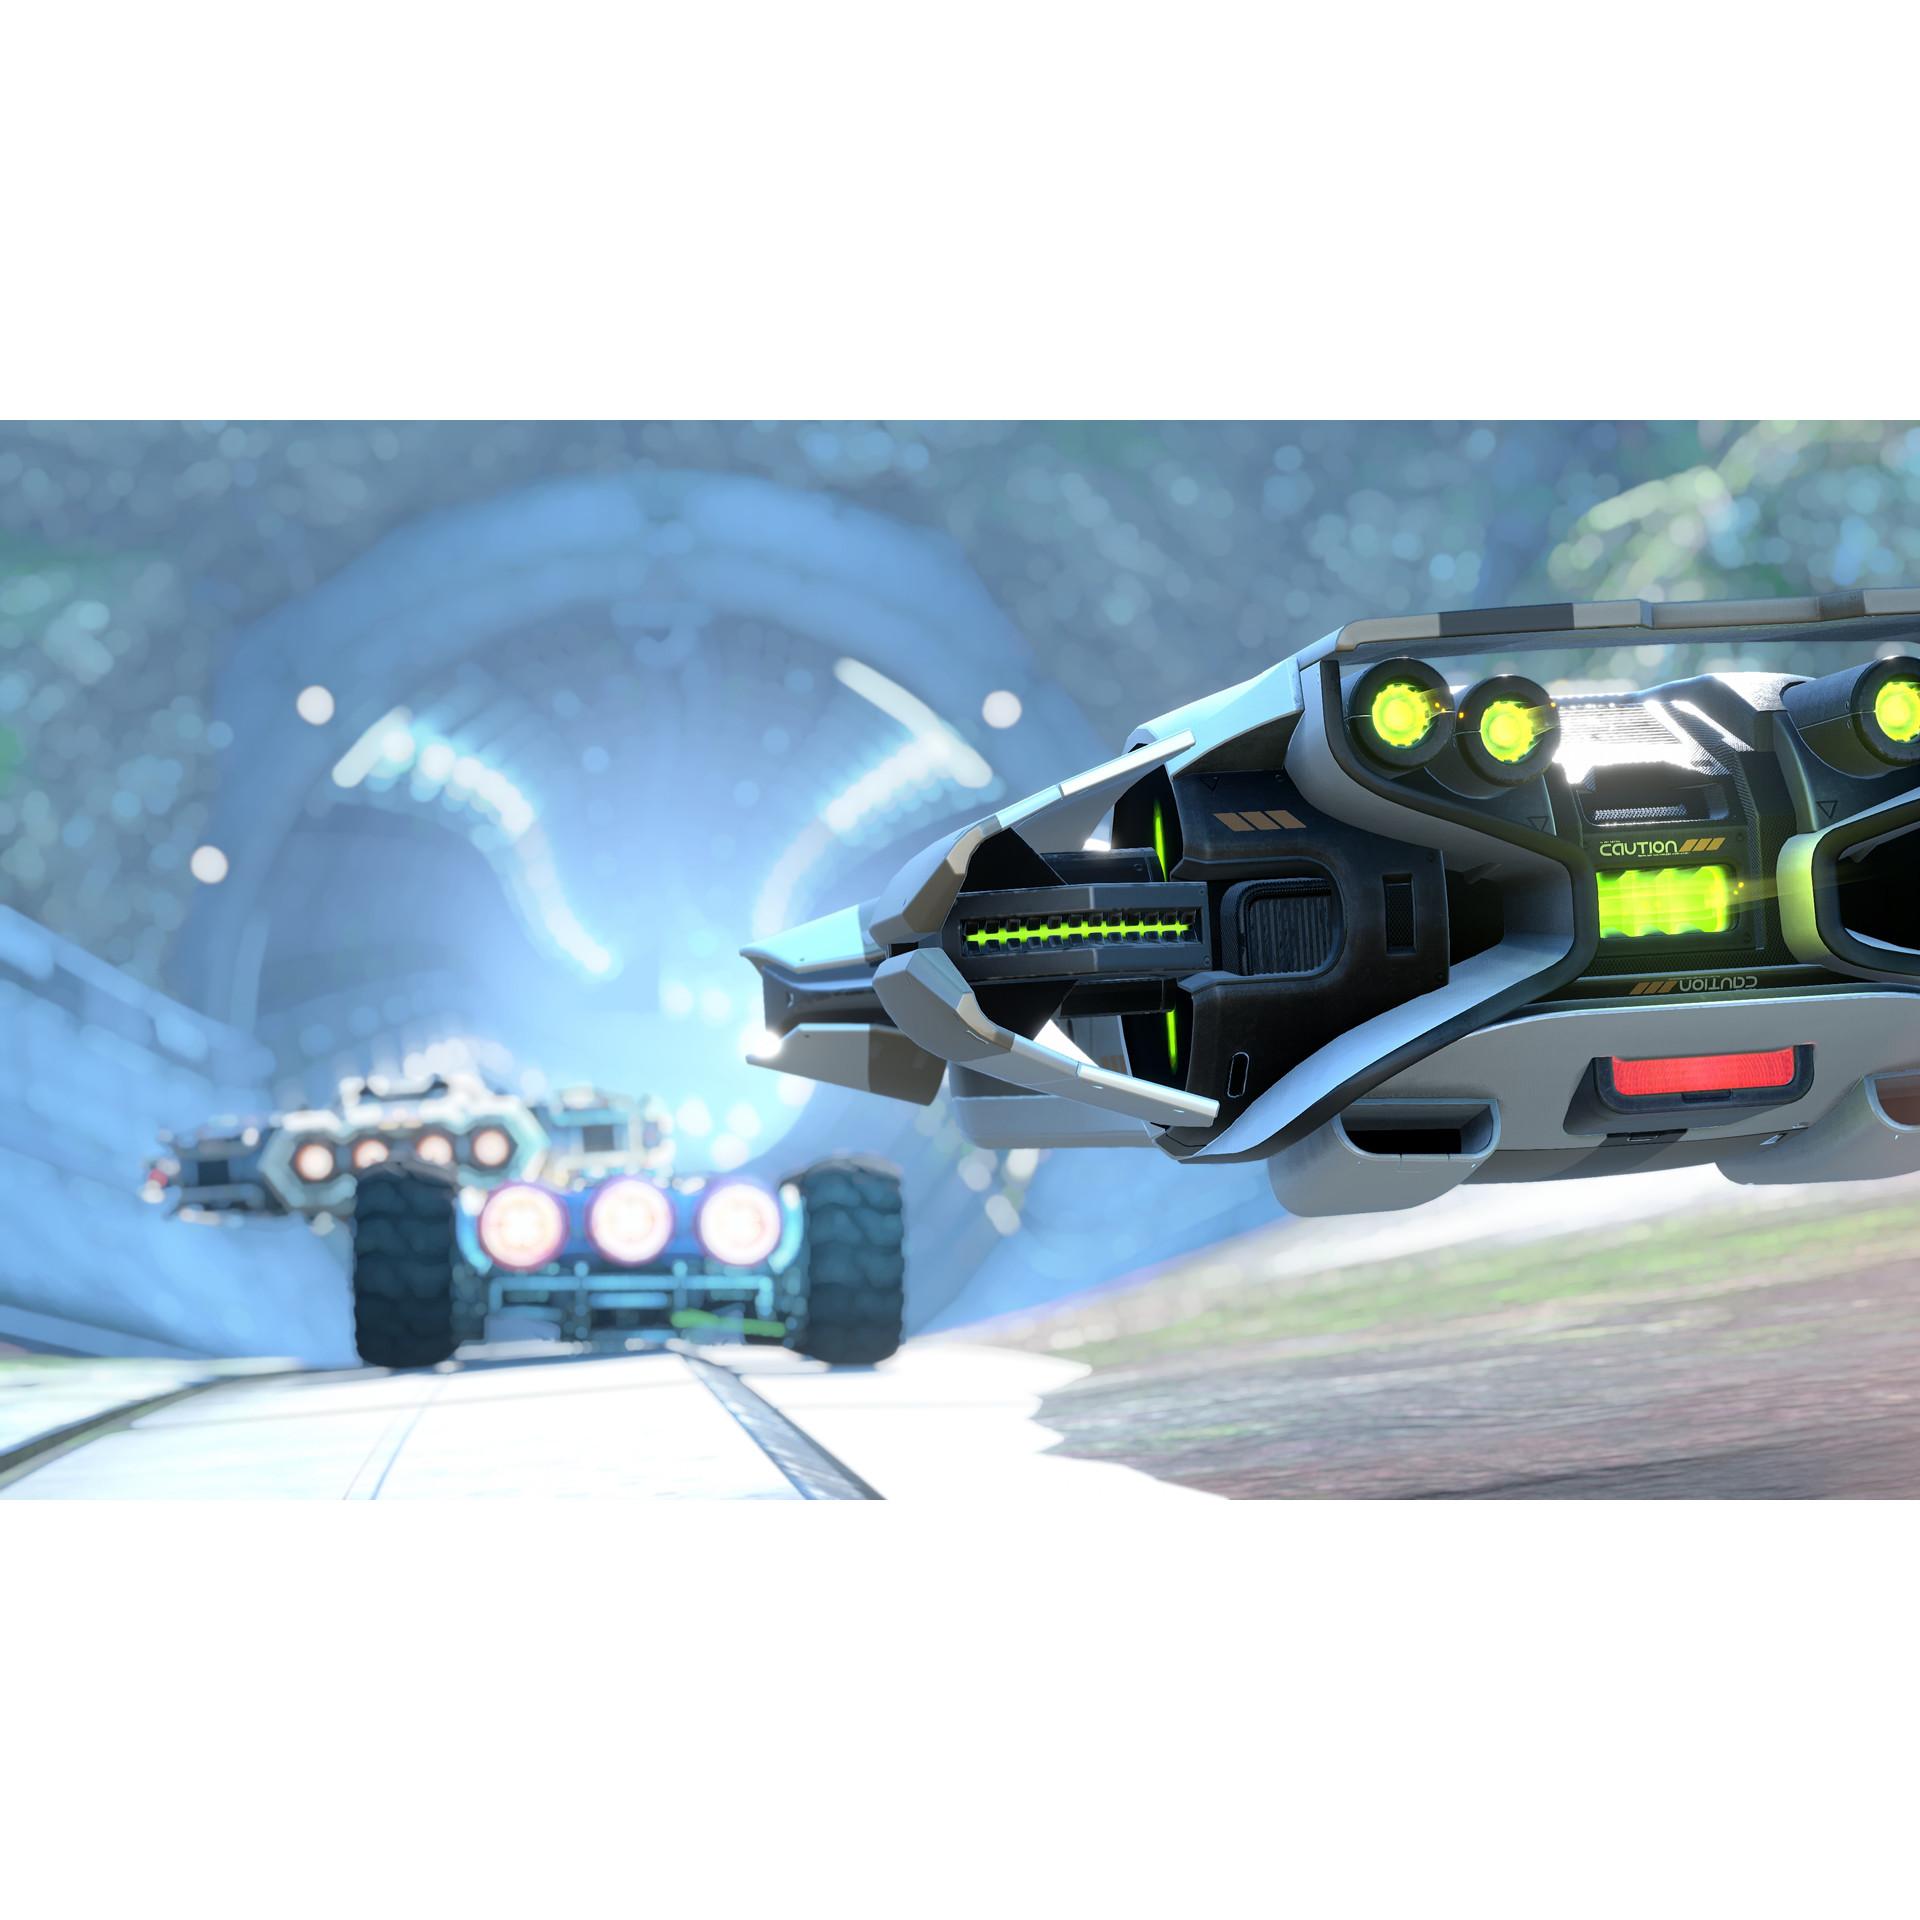 Joc GRIP: Combat Racing - Airblades vs Rollers - Ultimate Edition (EU) Pentru PlayStation 4 1